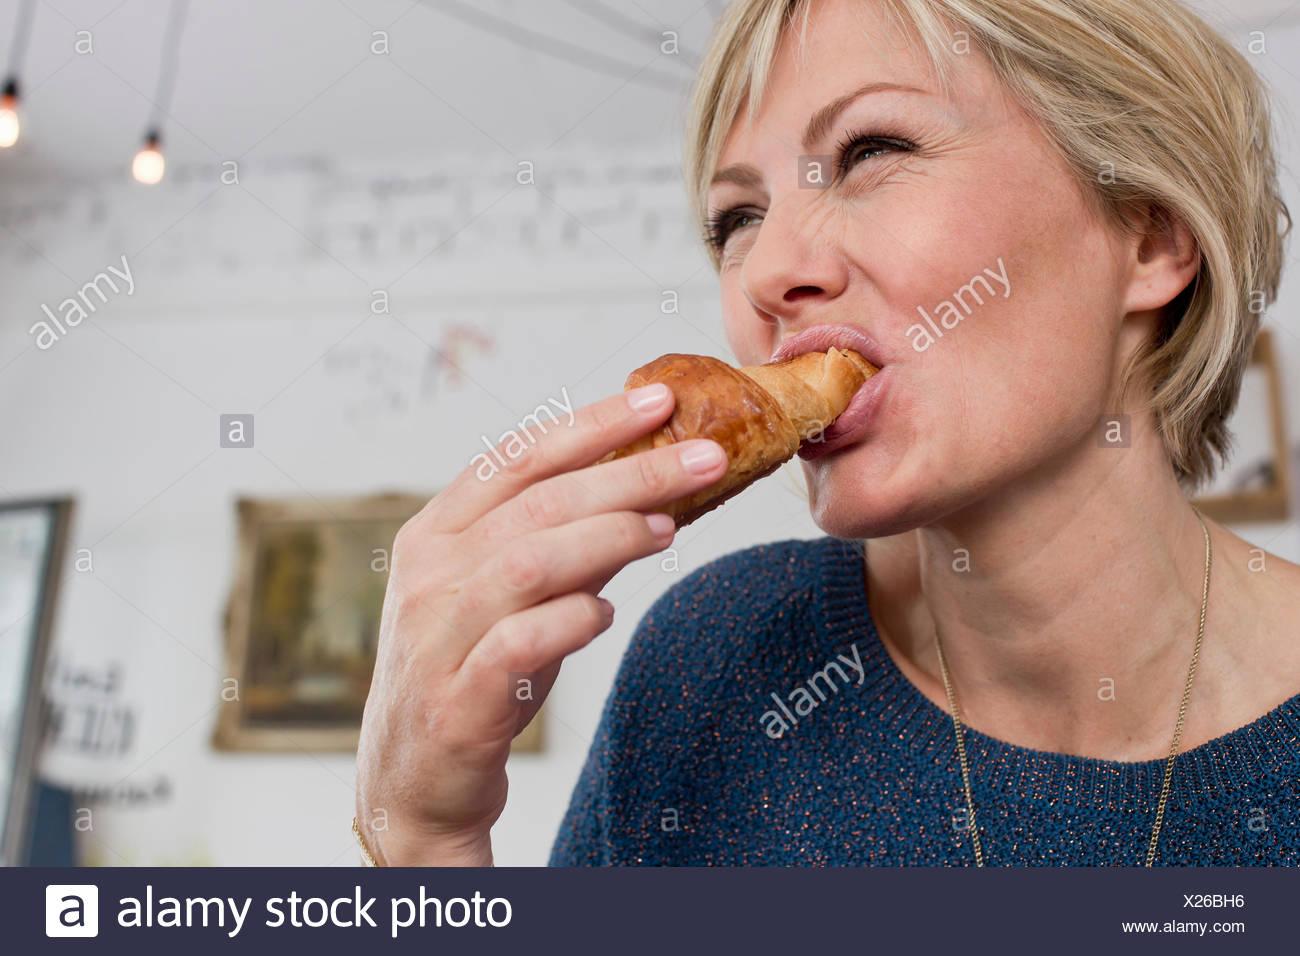 Mitte Erwachsene Frau Essen croissant Stockbild